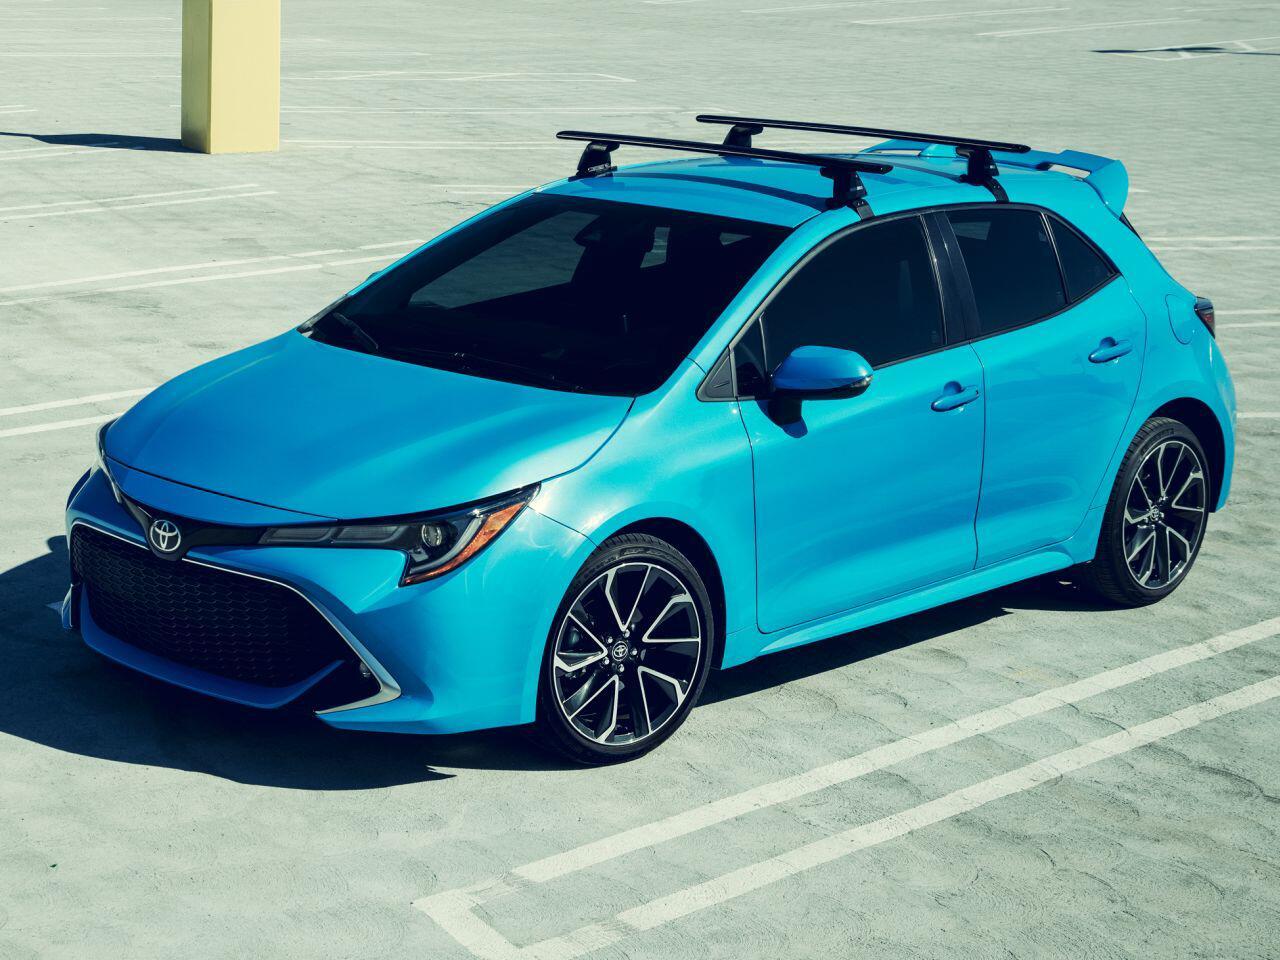 Bild zu Toyota Corolla Hatchback (Auris)